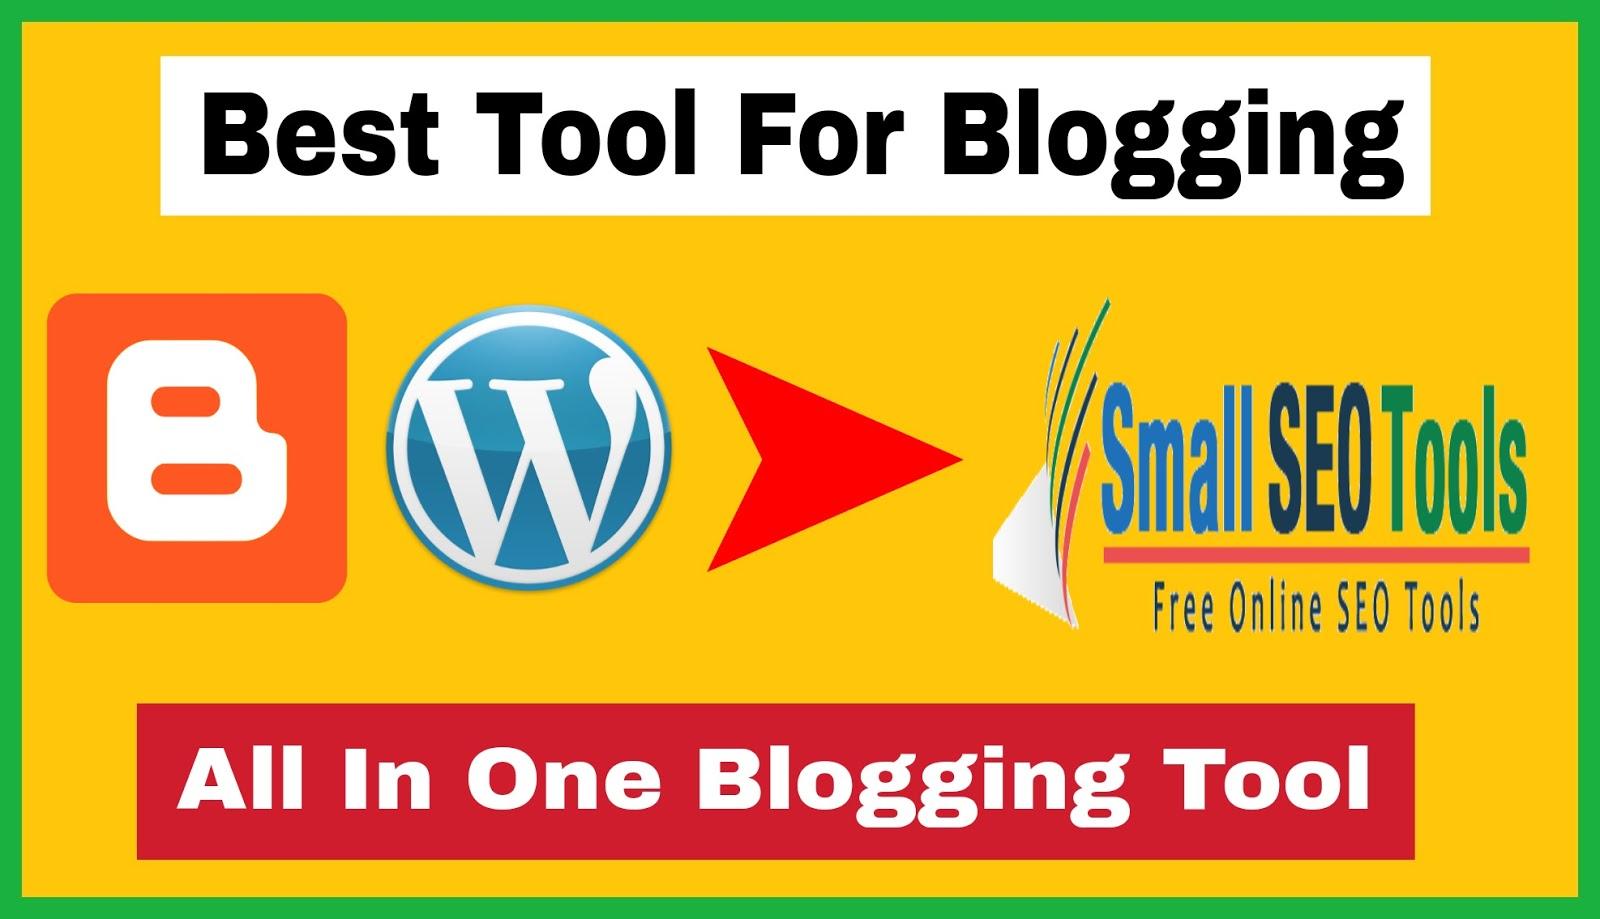 Best Tool For Blogging